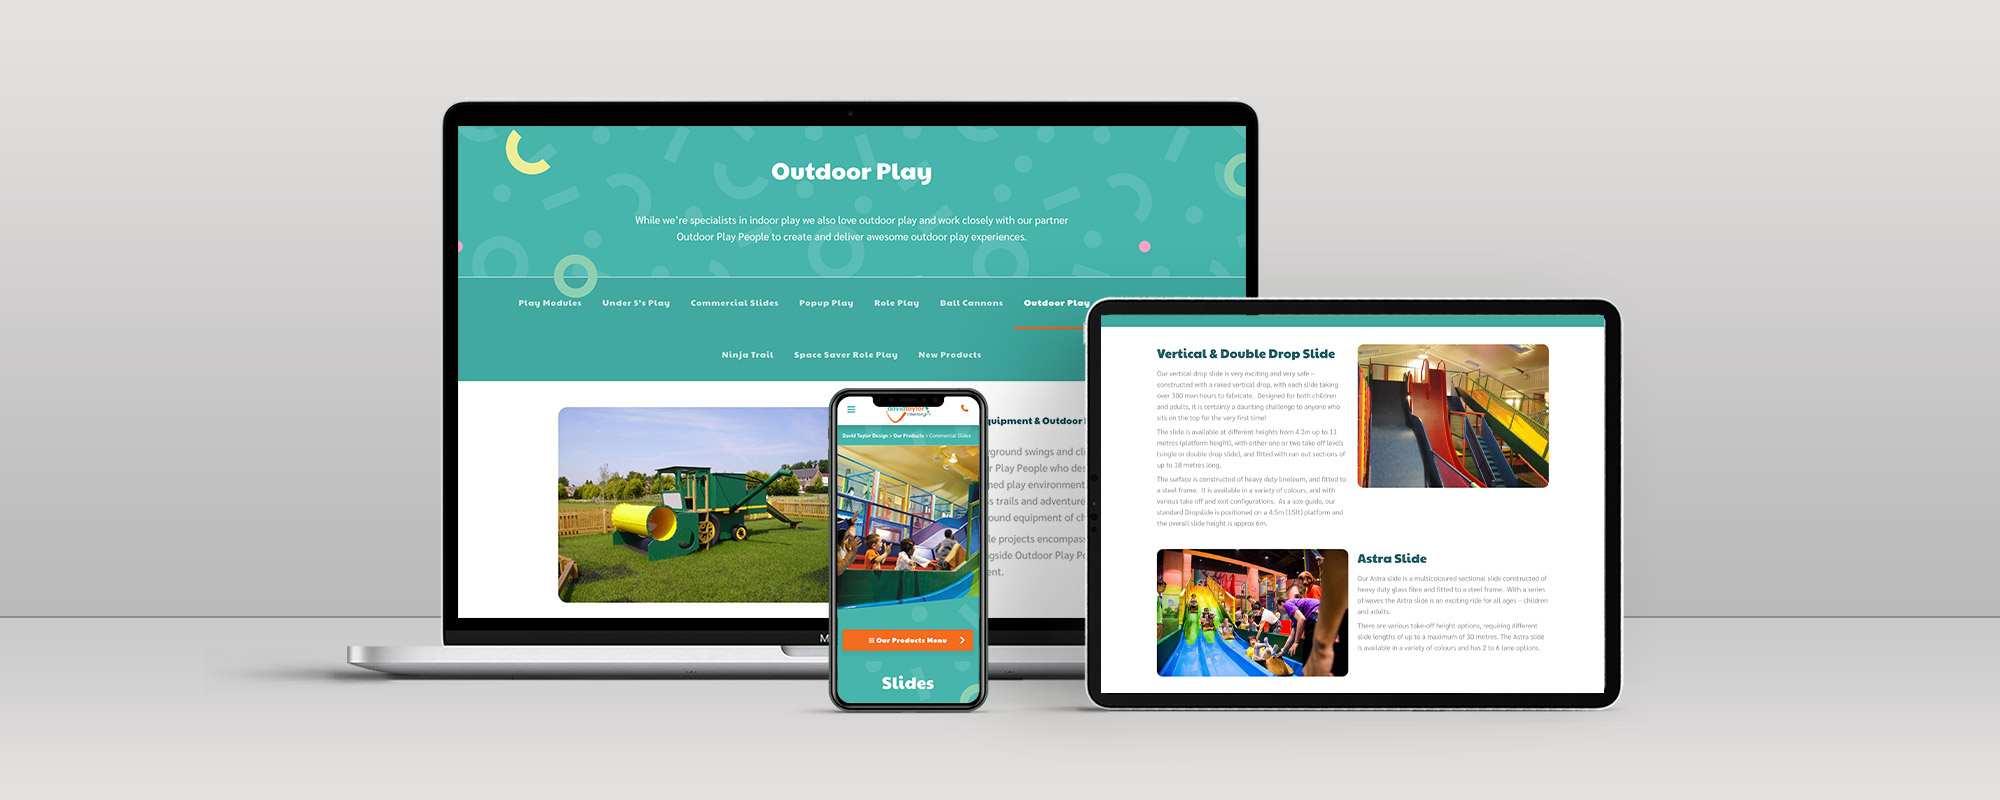 David Taylor Design Wordpress Website Design on 3 Devices